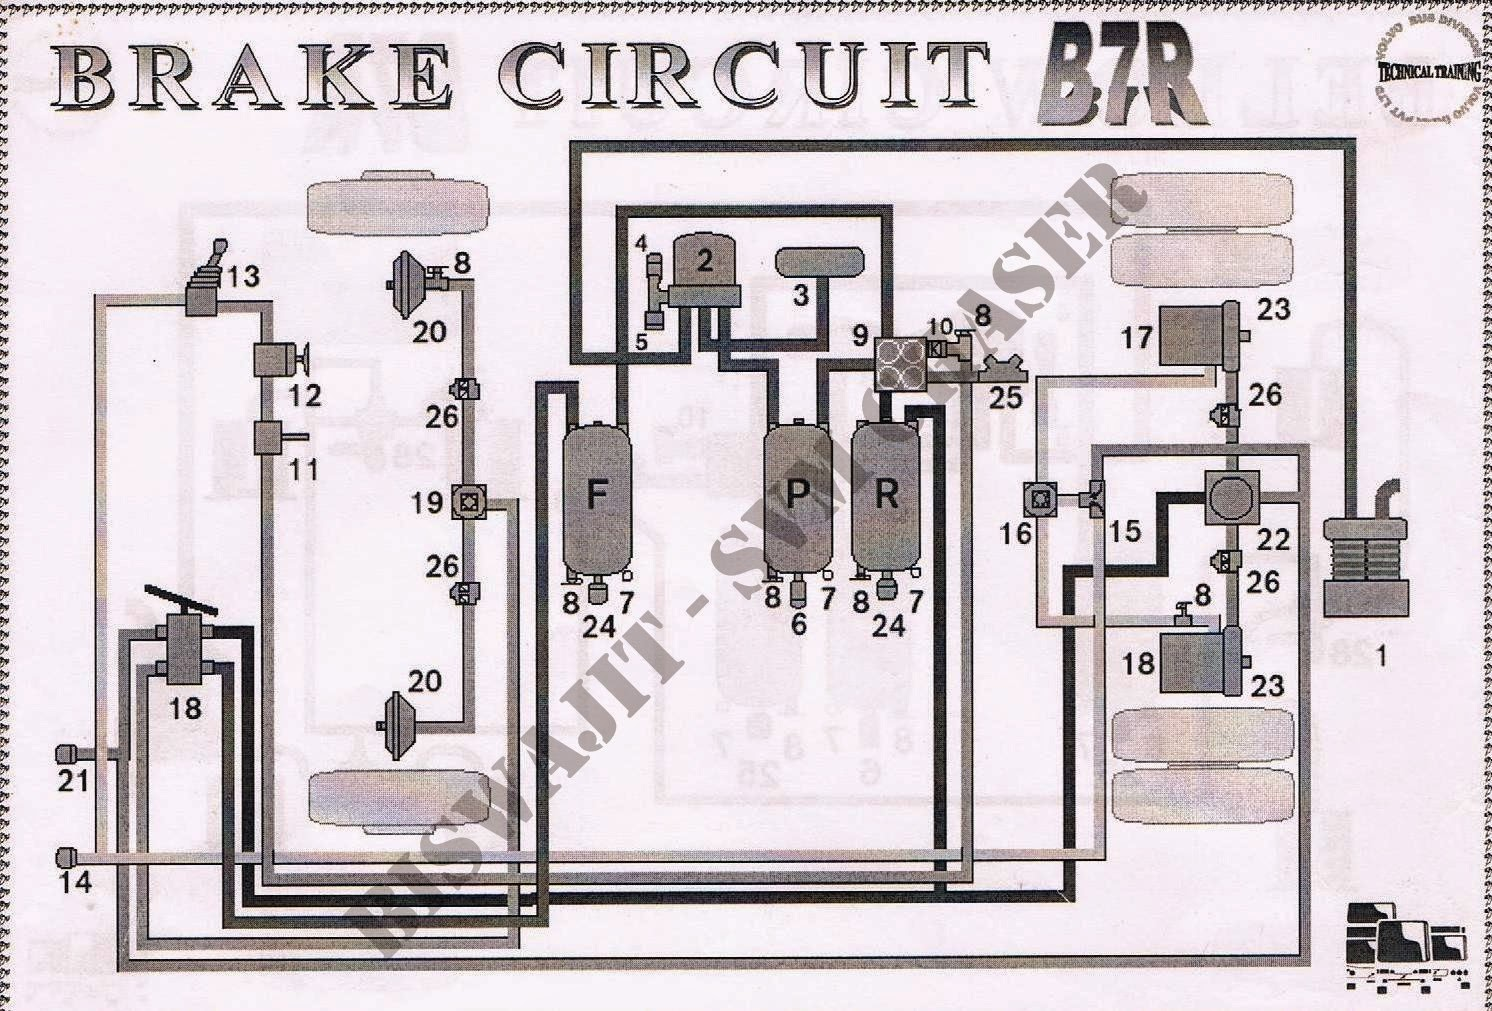 1977 mack wiring diagram wiring diagram fancy 4700 international truck wiring diagrams picture collection mack truck wiring harness 1977 mack wiring diagram fandeluxe Gallery